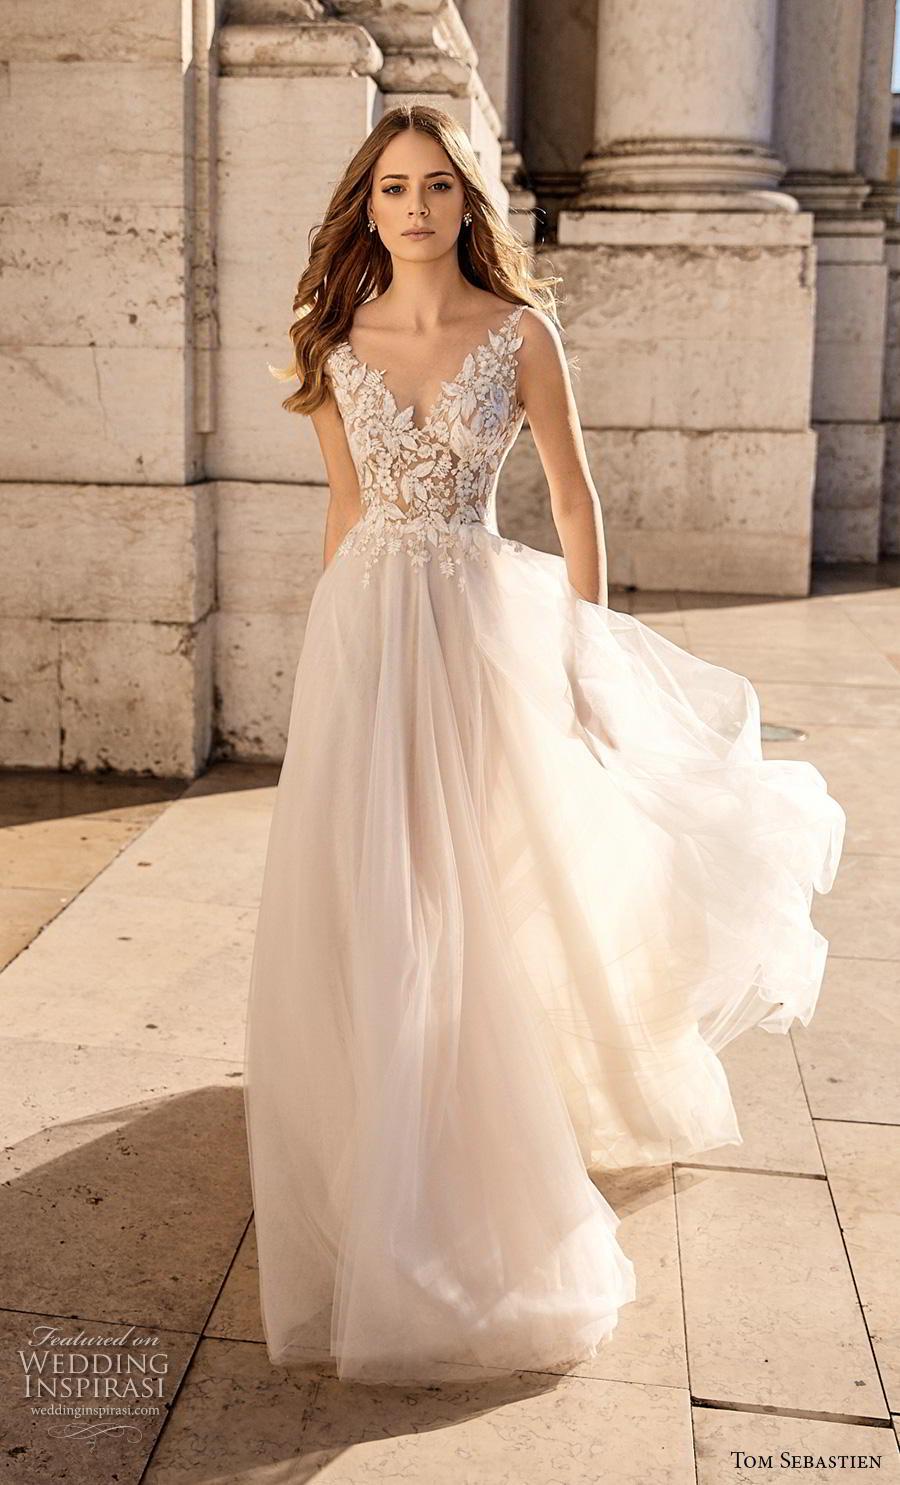 tom sebastian 2019 bridal sleeveless v neck heavily embellished bodice romantic soft a line wedding dress v back (7) mv